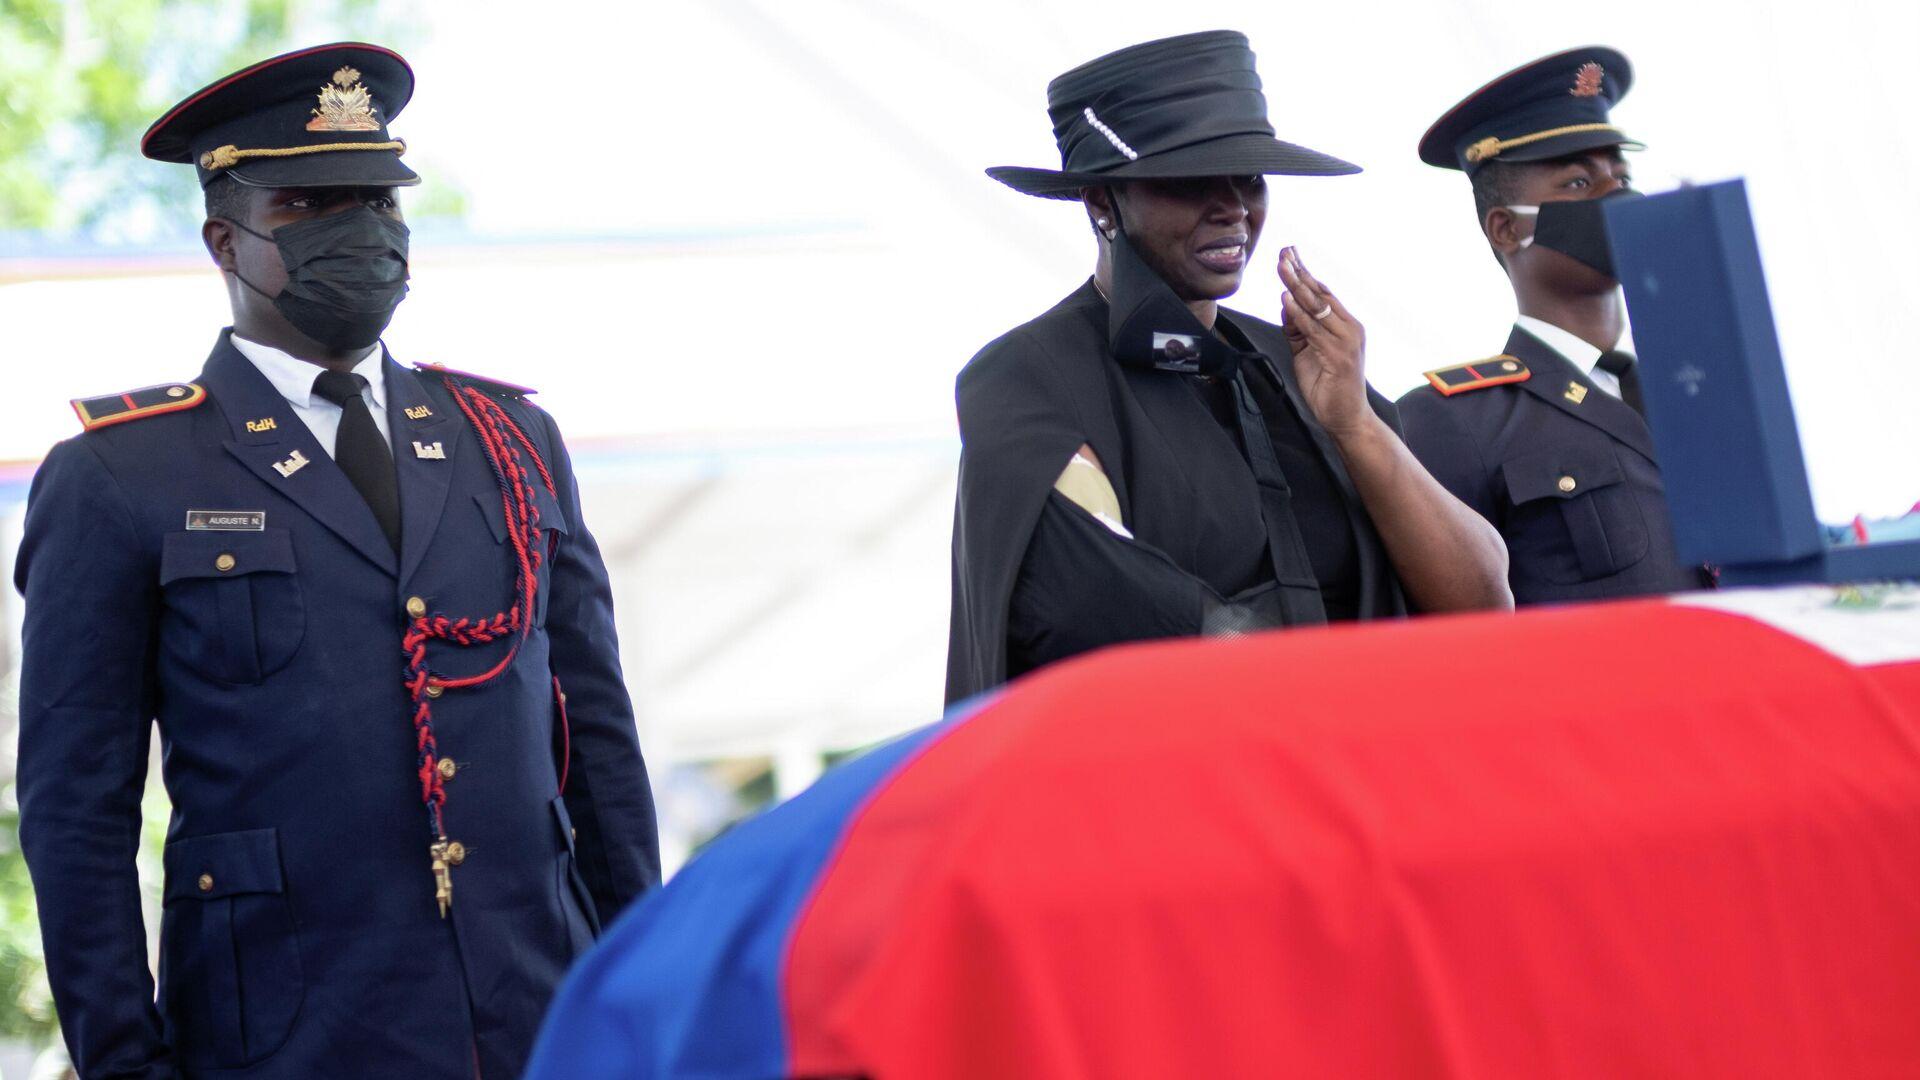 La ex primera dama de Haití, Martine Moise, durante el funeral de su esposo, Jovenel Moise - Sputnik Mundo, 1920, 03.08.2021